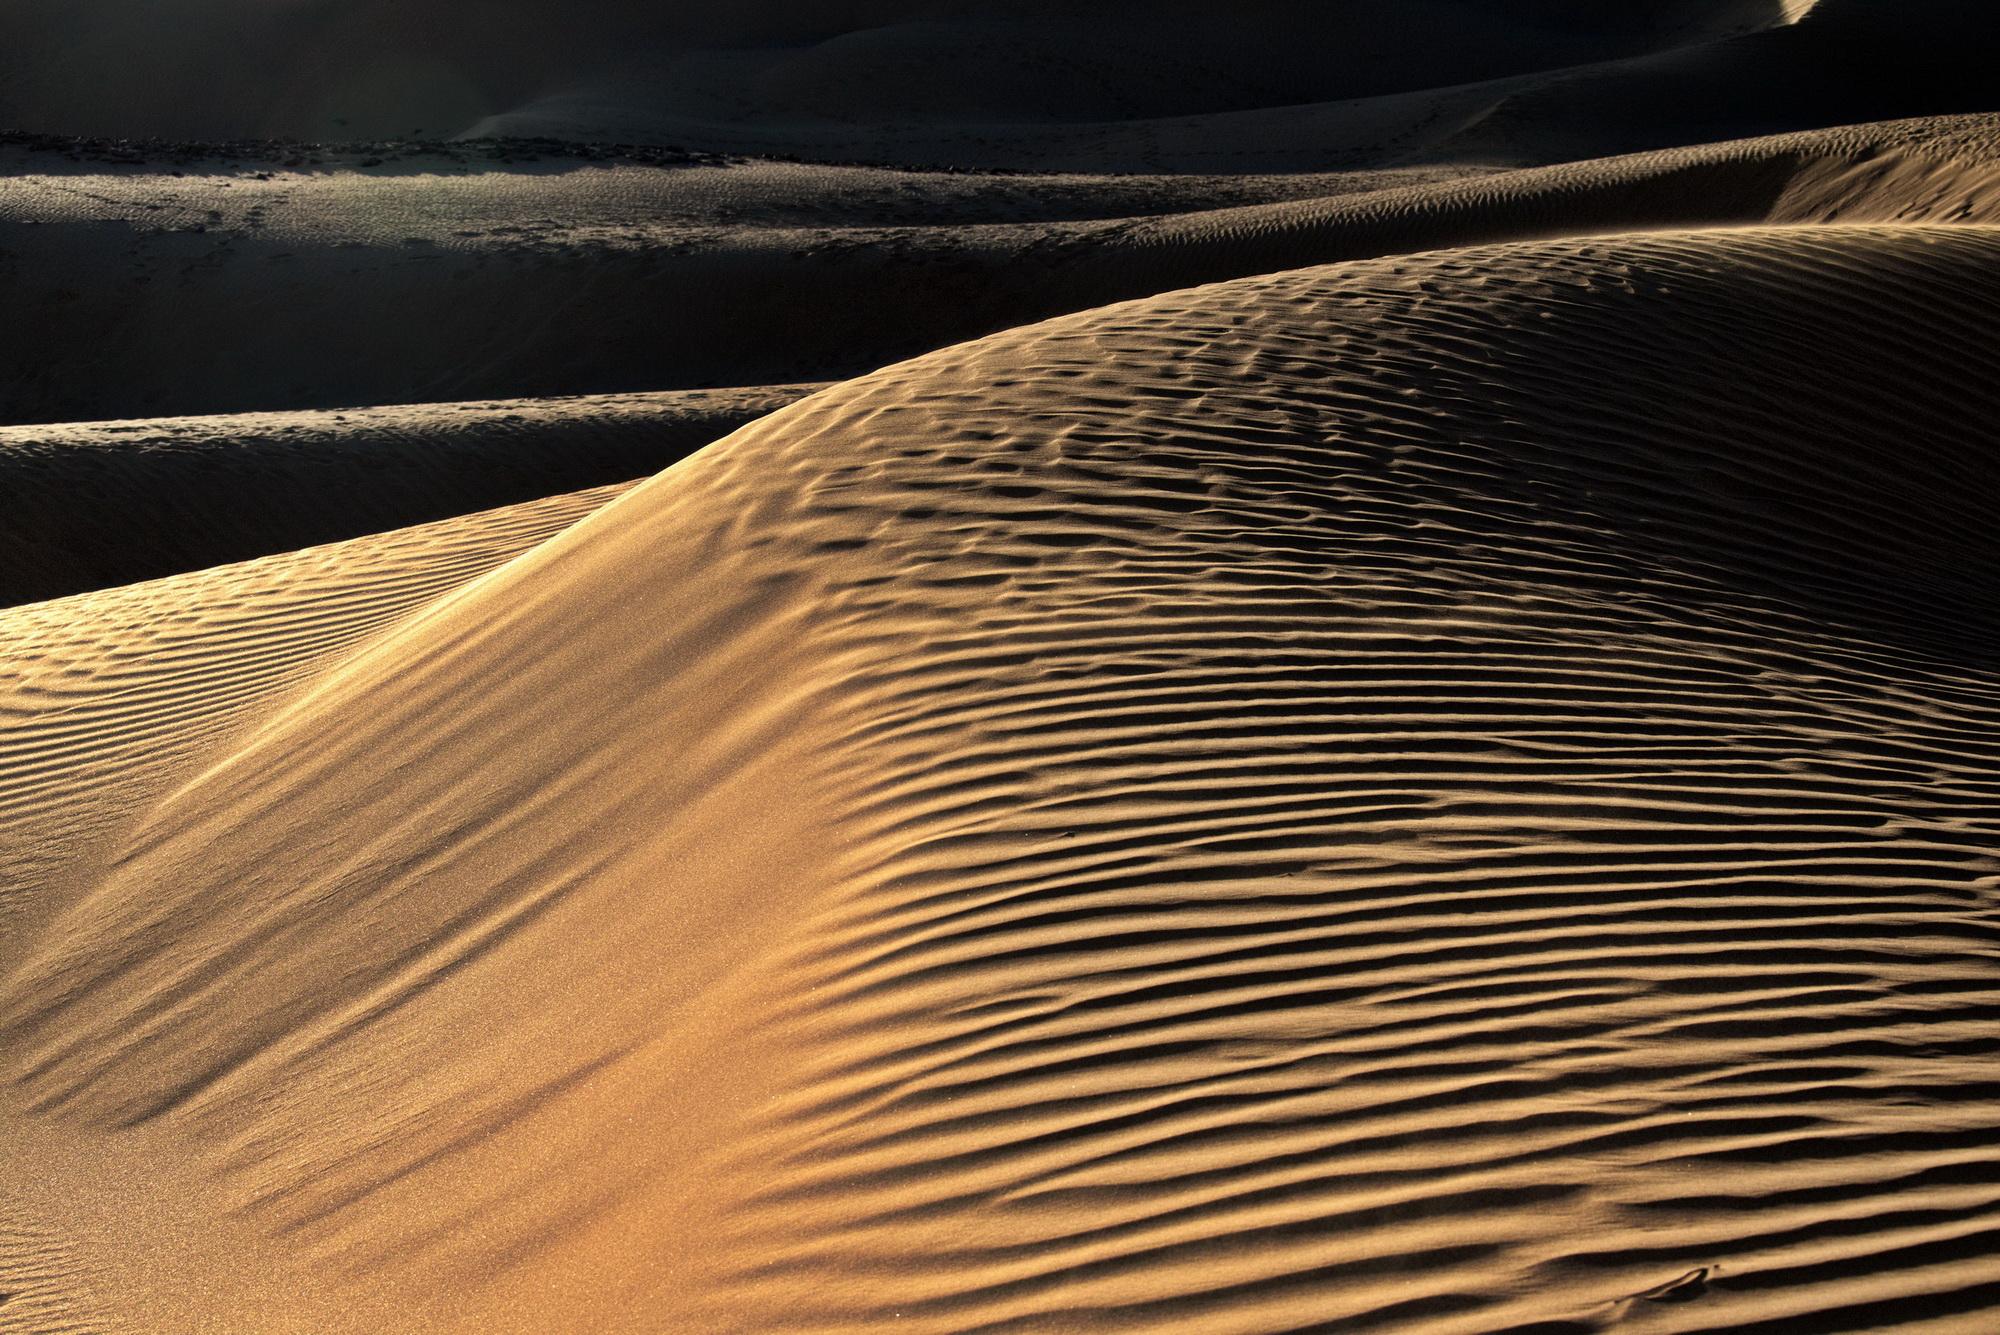 Embracing Dune 2019 הדיונה העוטפת